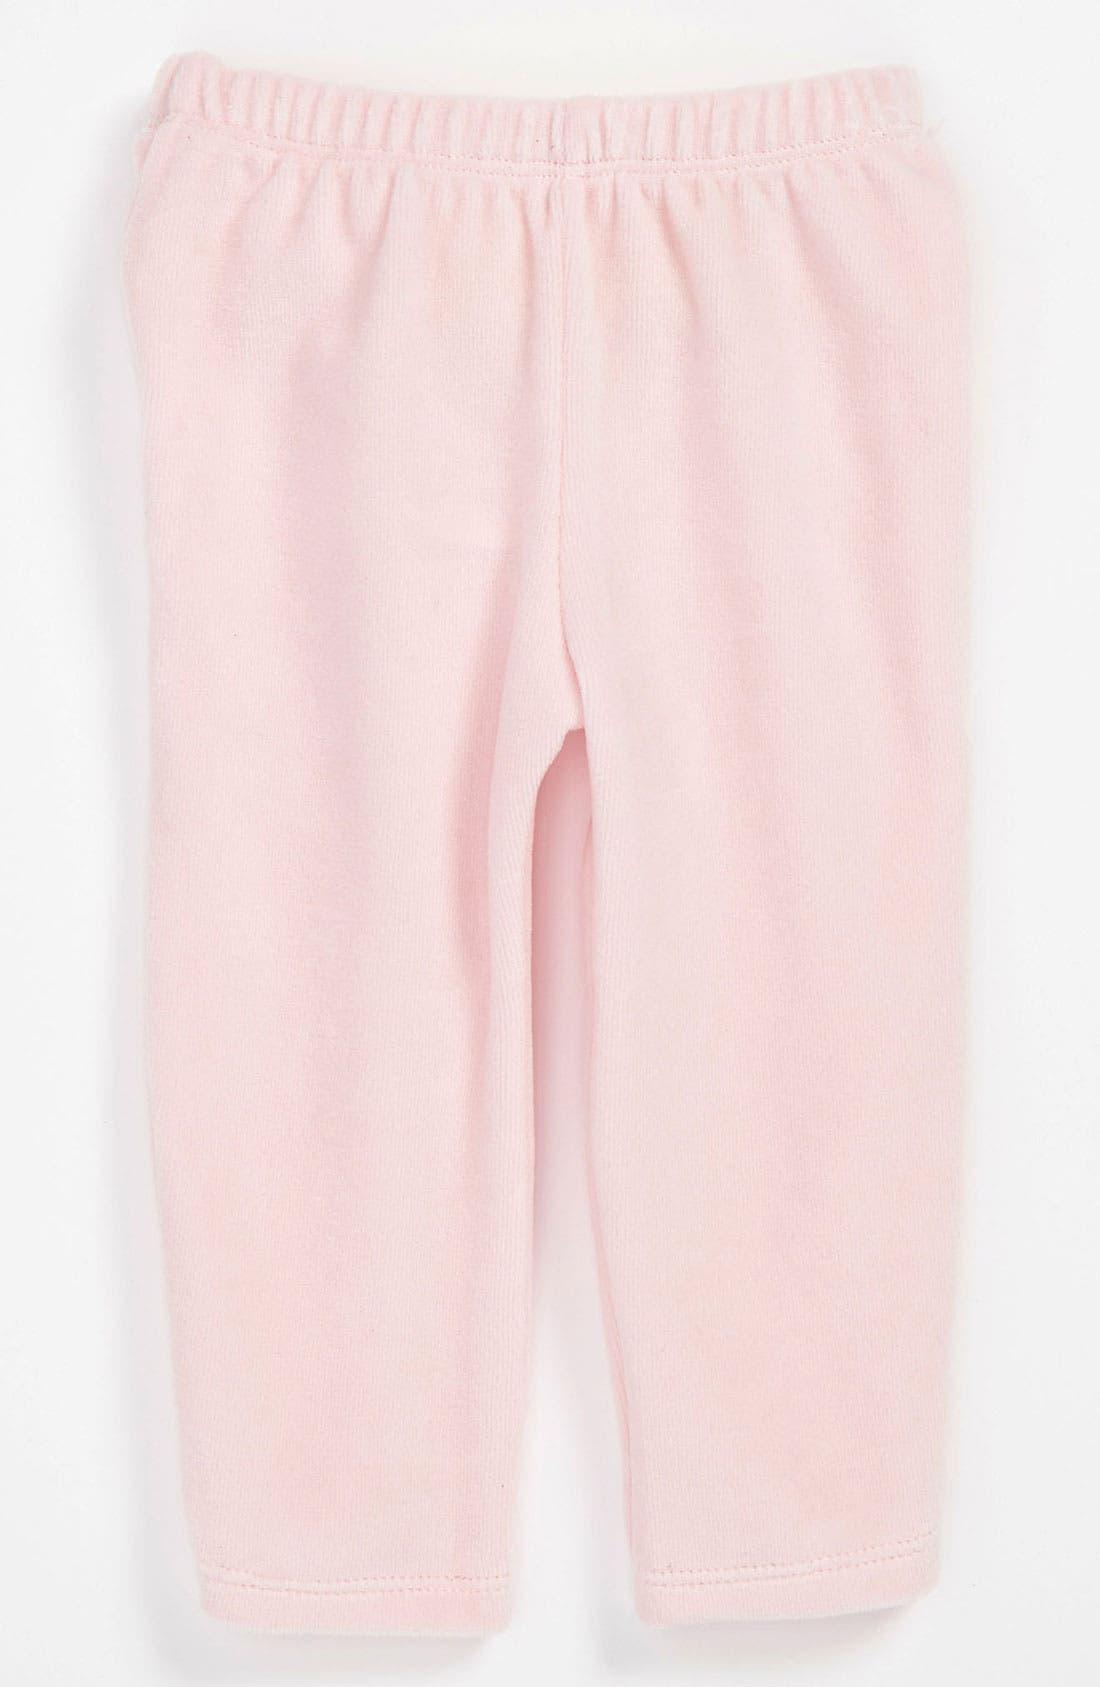 Alternate Image 1 Selected - United Colors of Benetton Kids Velour Pants (Infant)